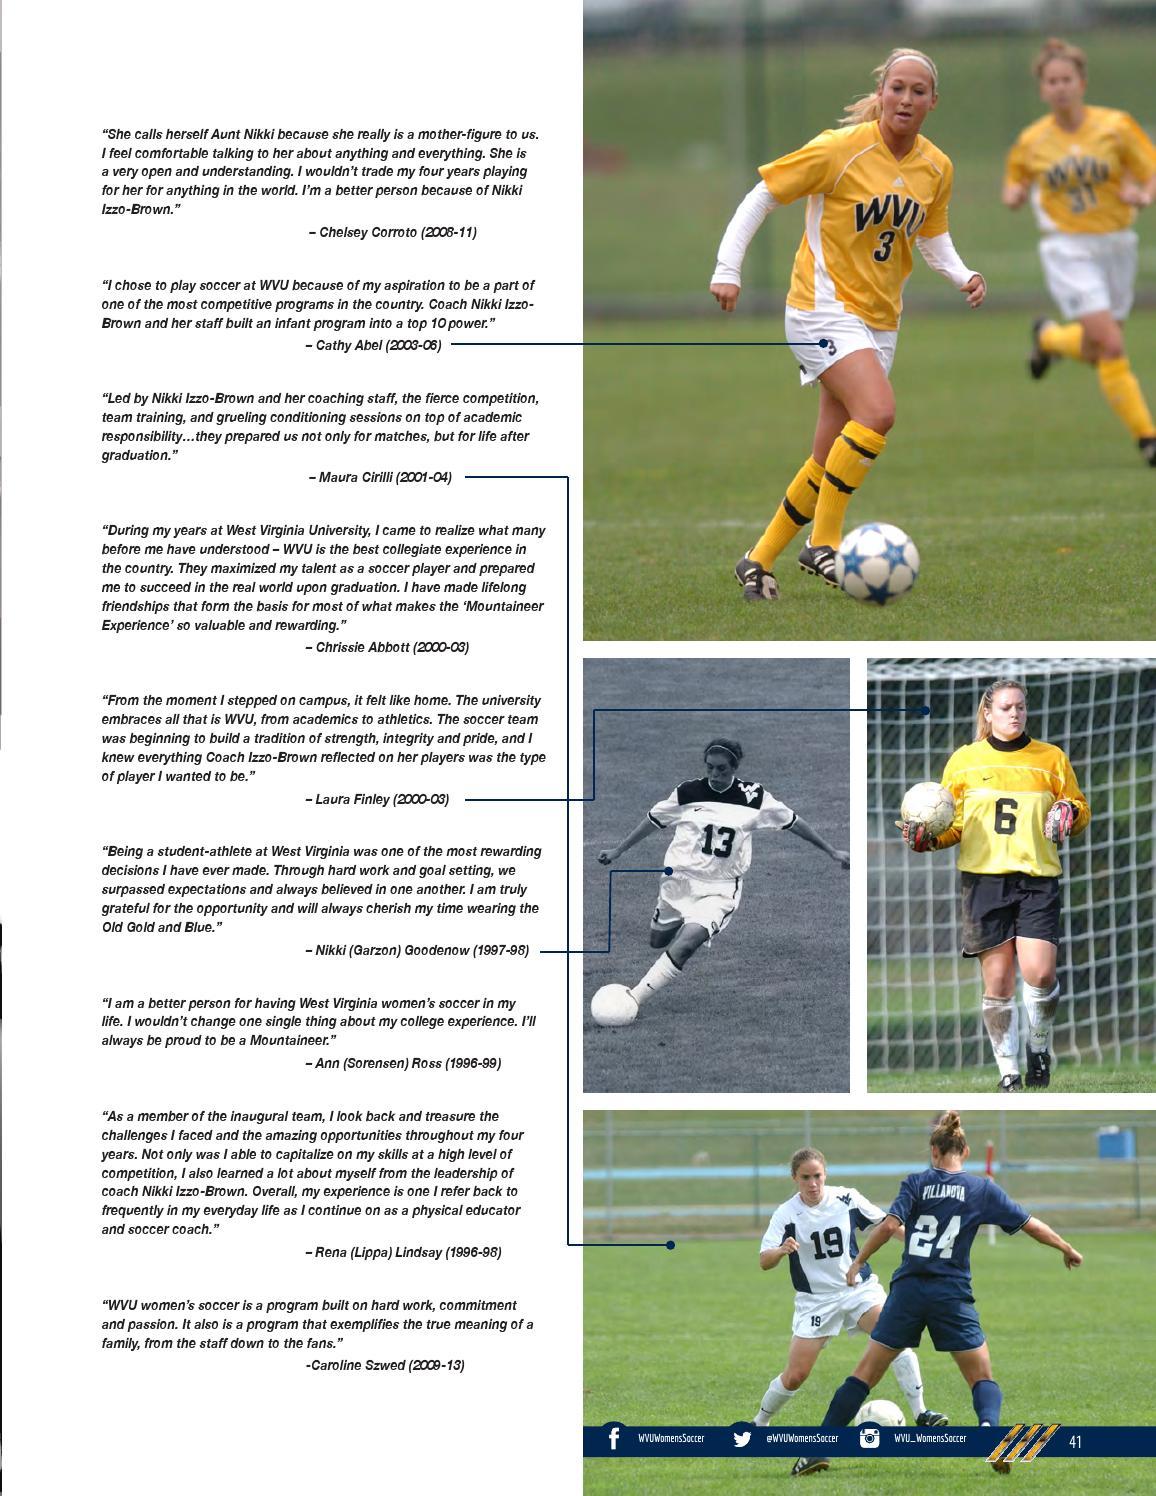 545bade695b 2015 WVU Women's Soccer Guide by Joe Swan - issuu